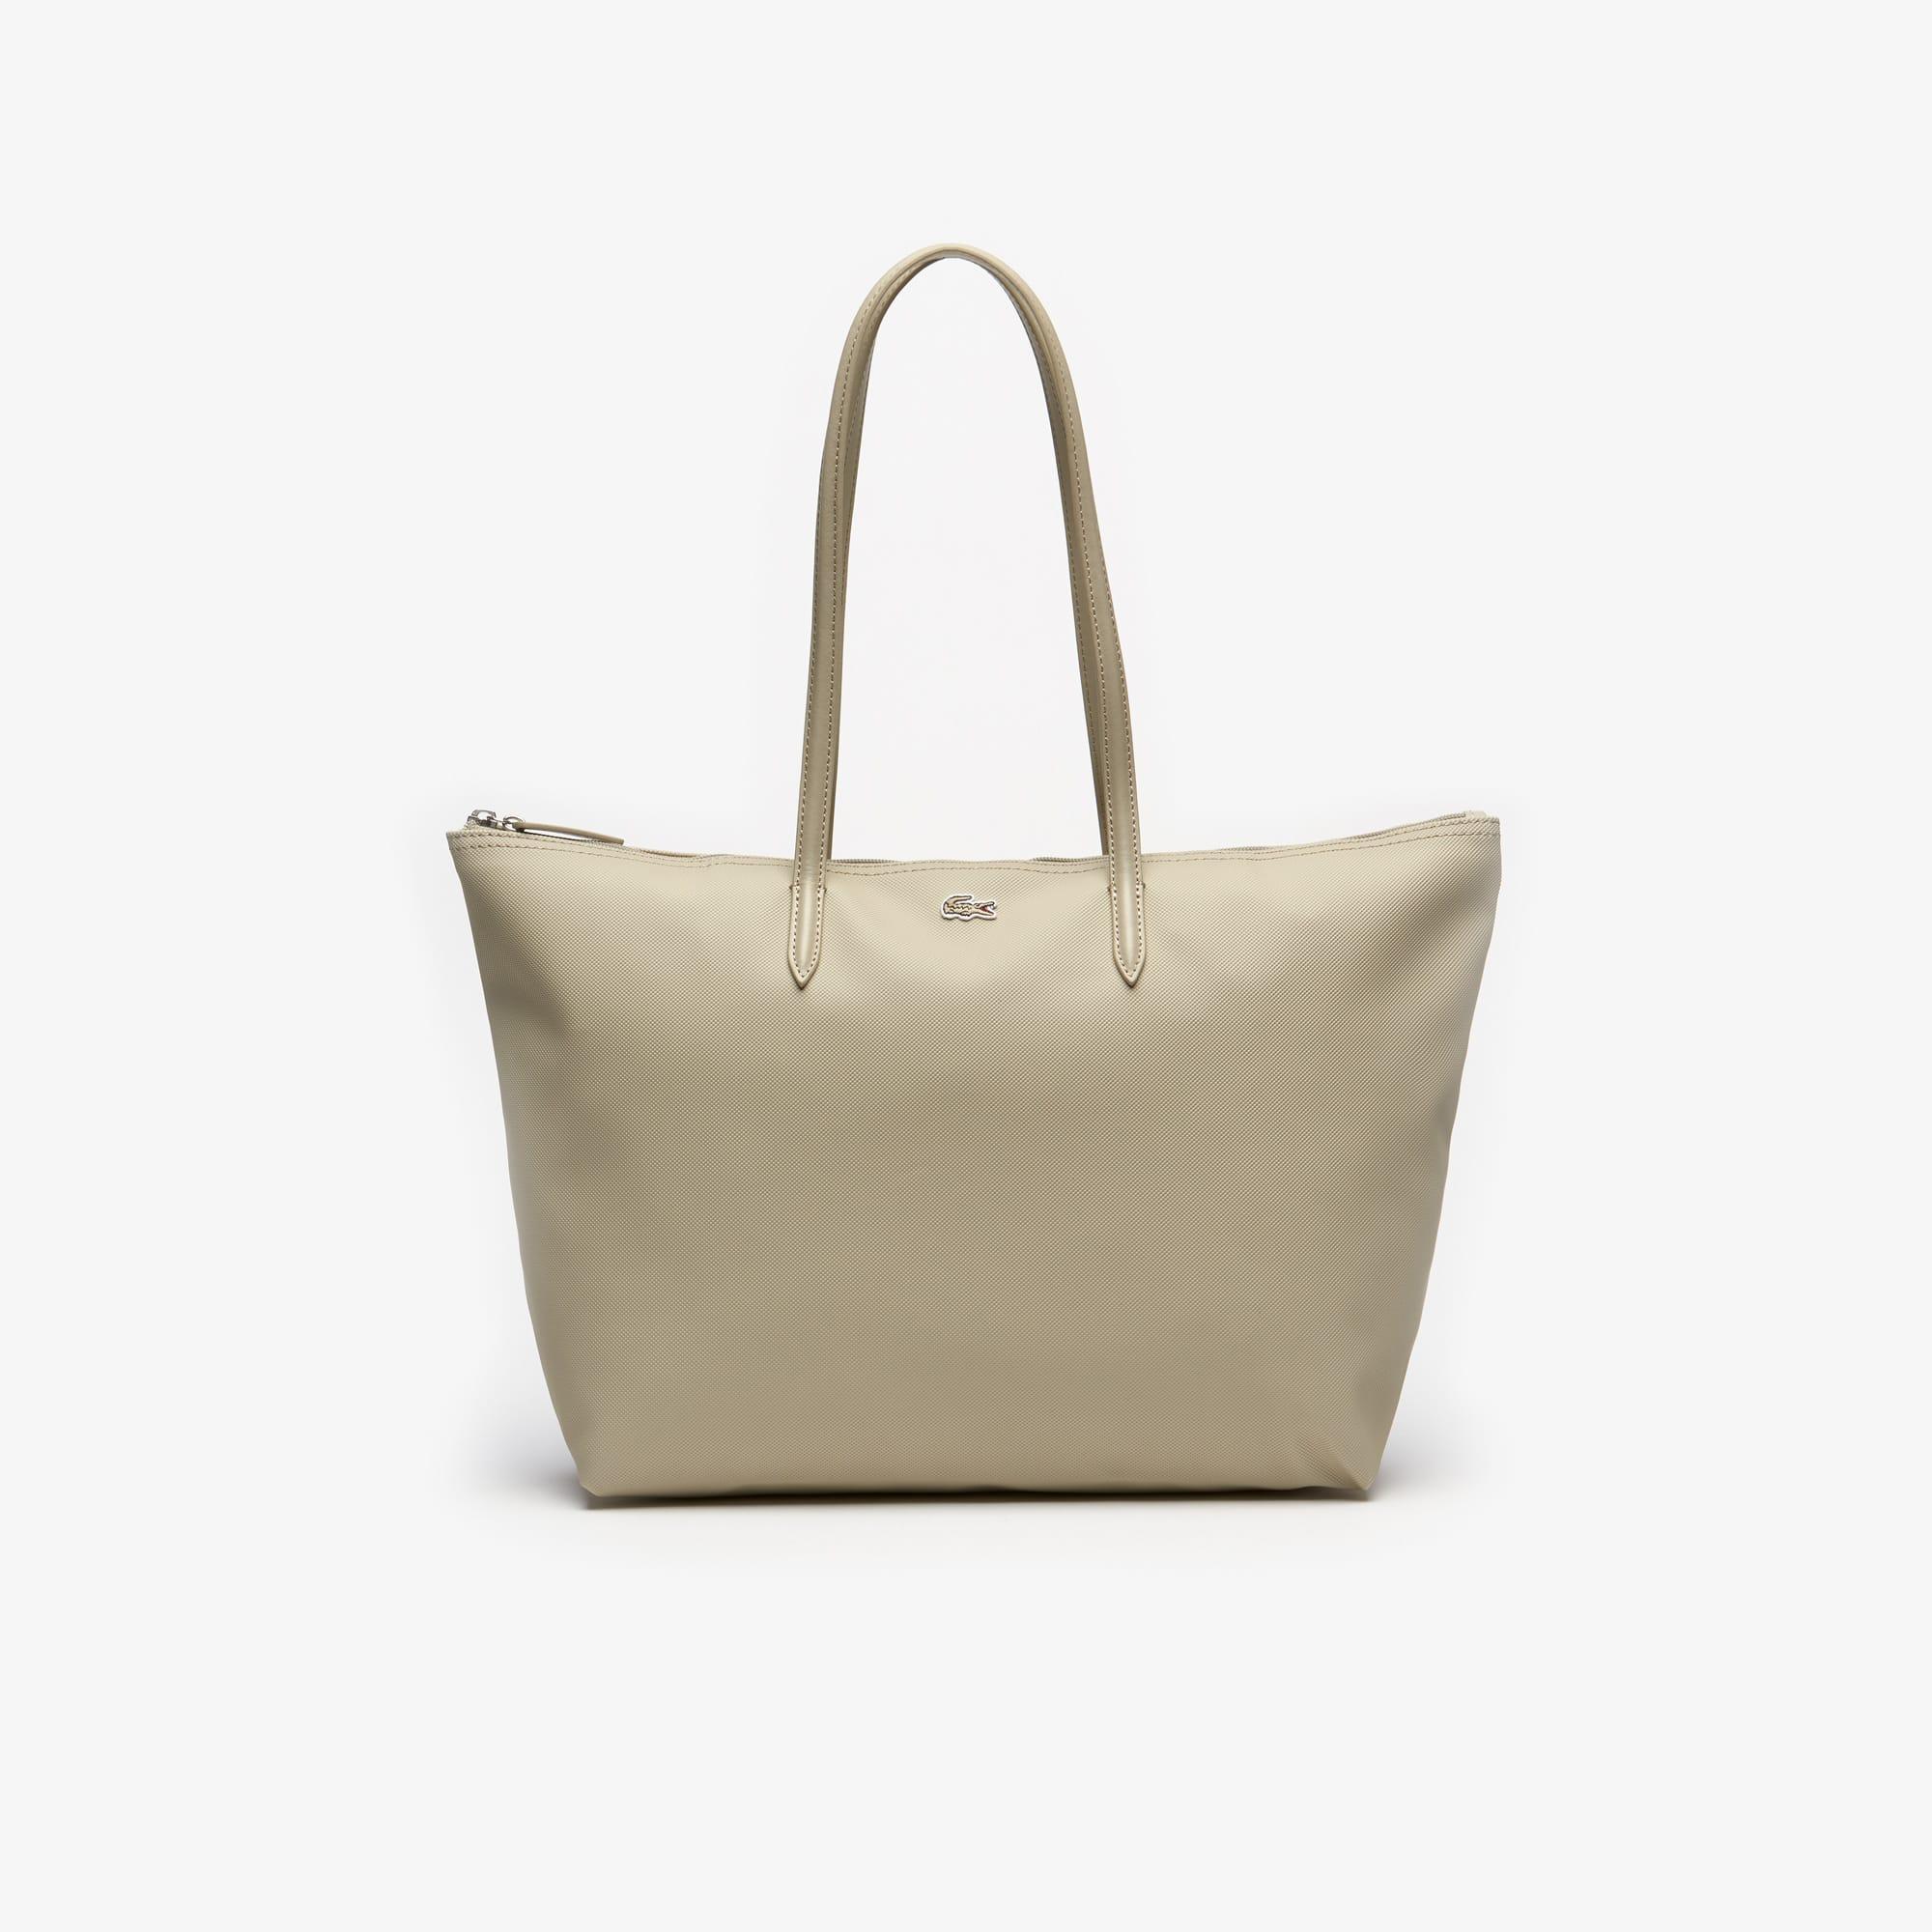 3c837b127e2 Bags & Handbags Collection | Women's Leather Goods | LACOSTE